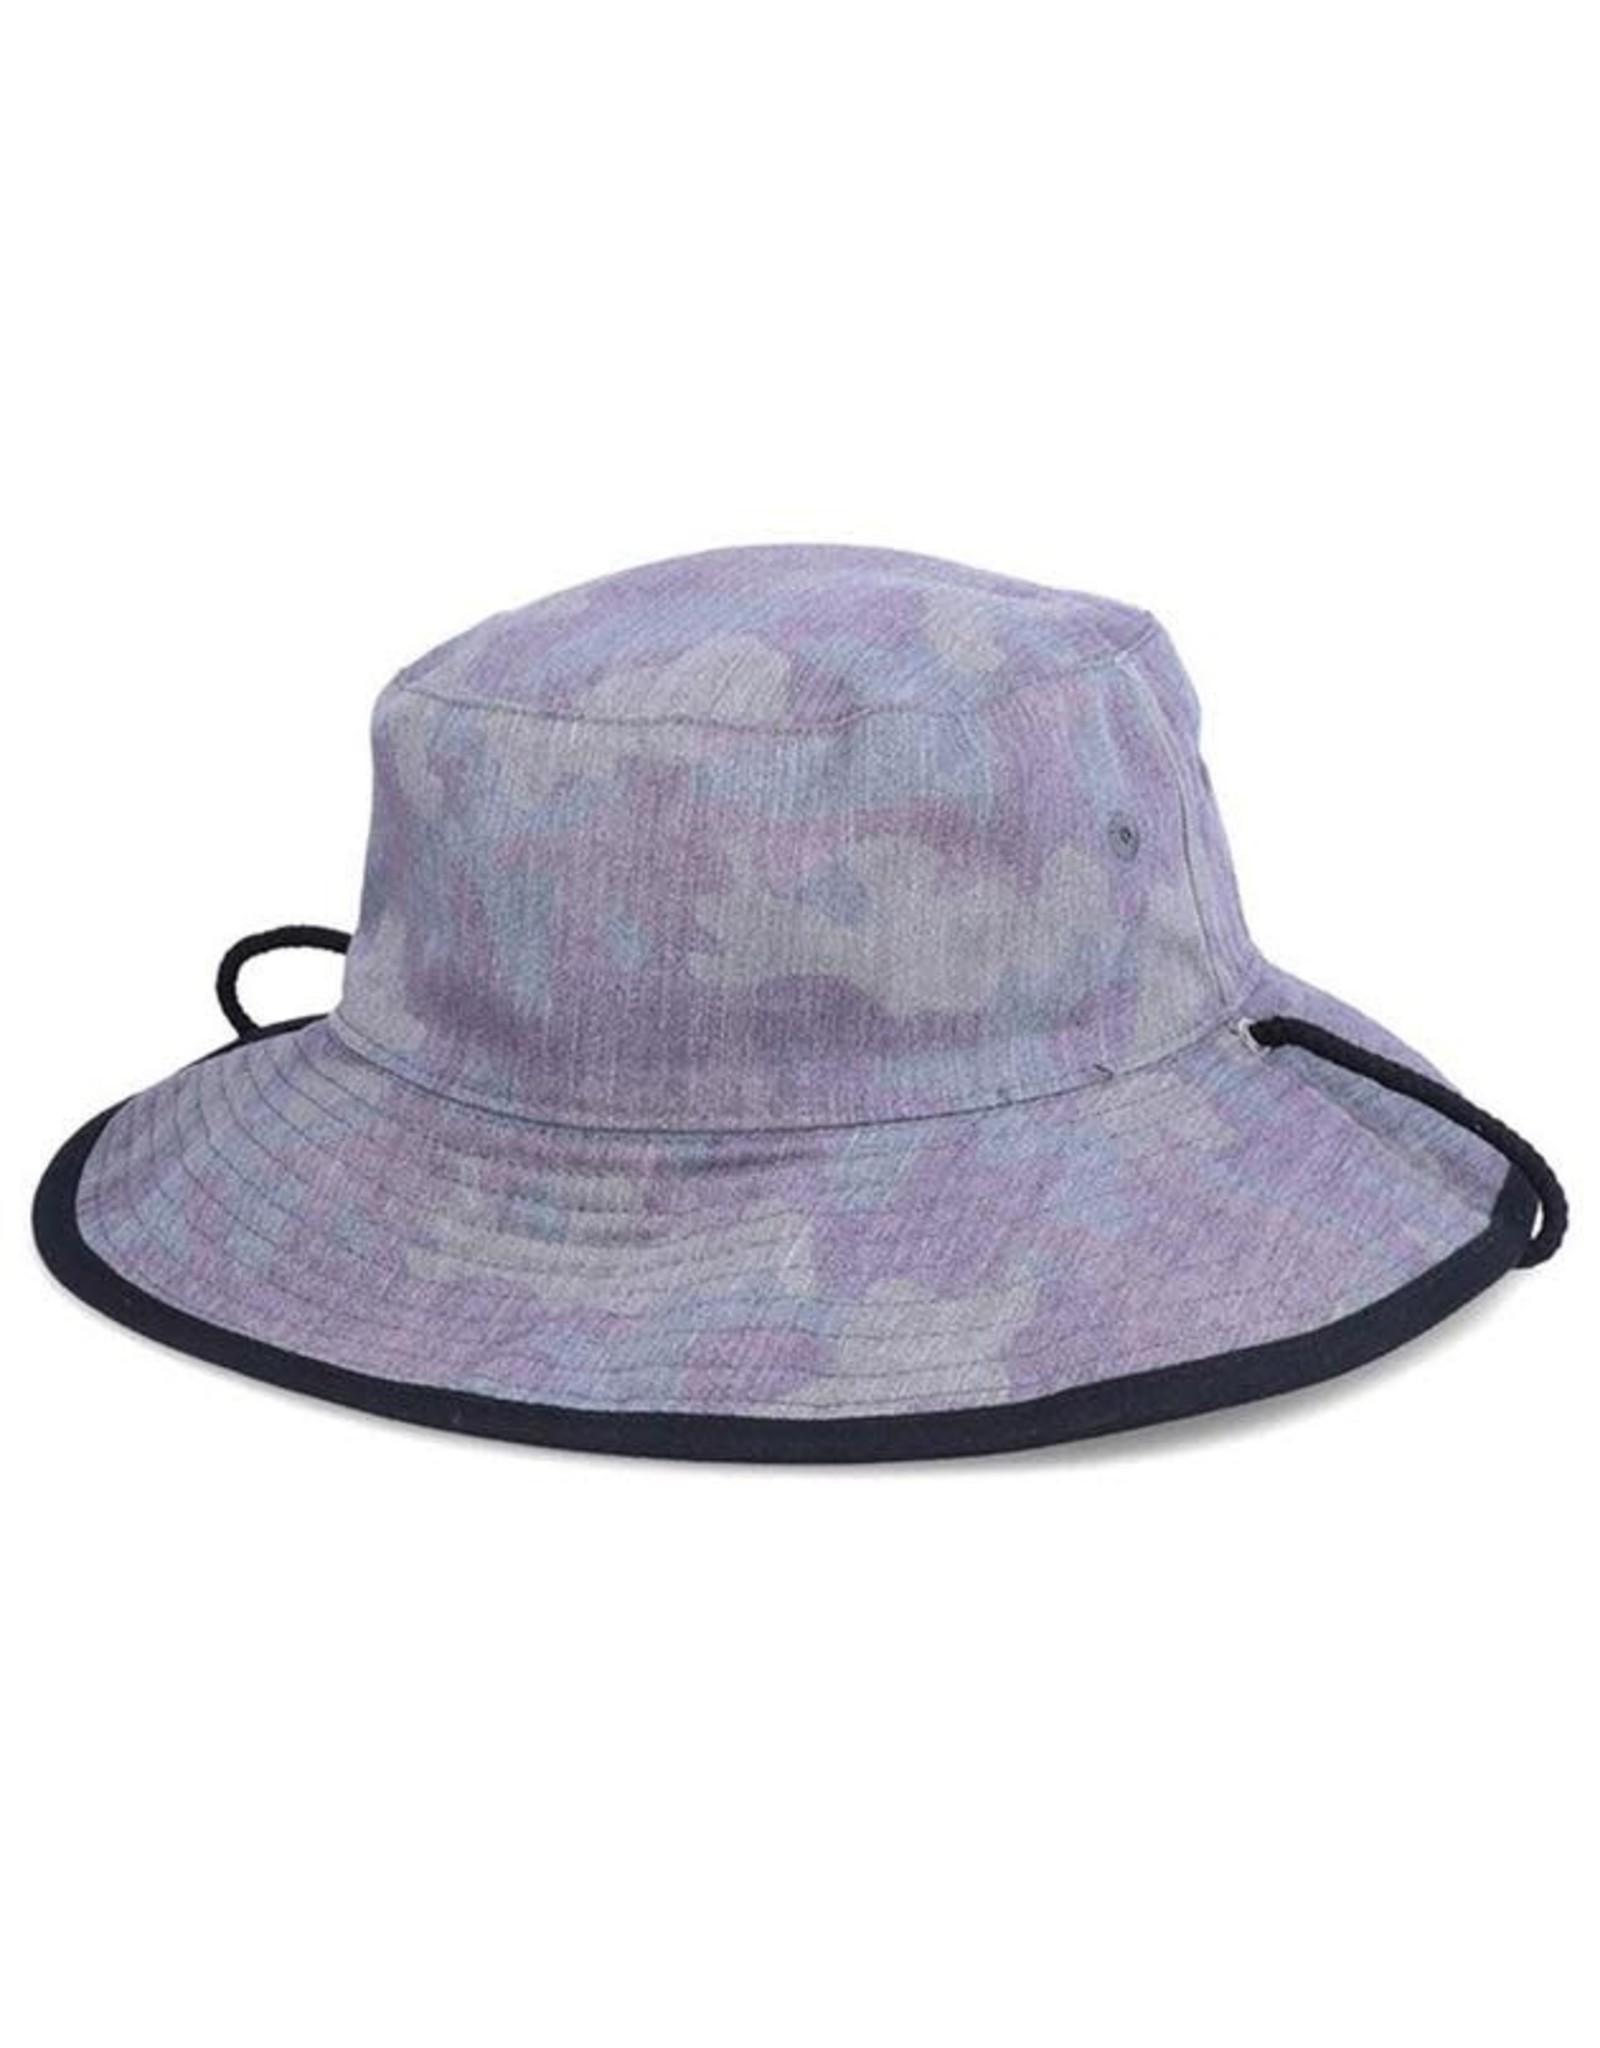 Rip Curl Revo Valley Mid Brim Hat